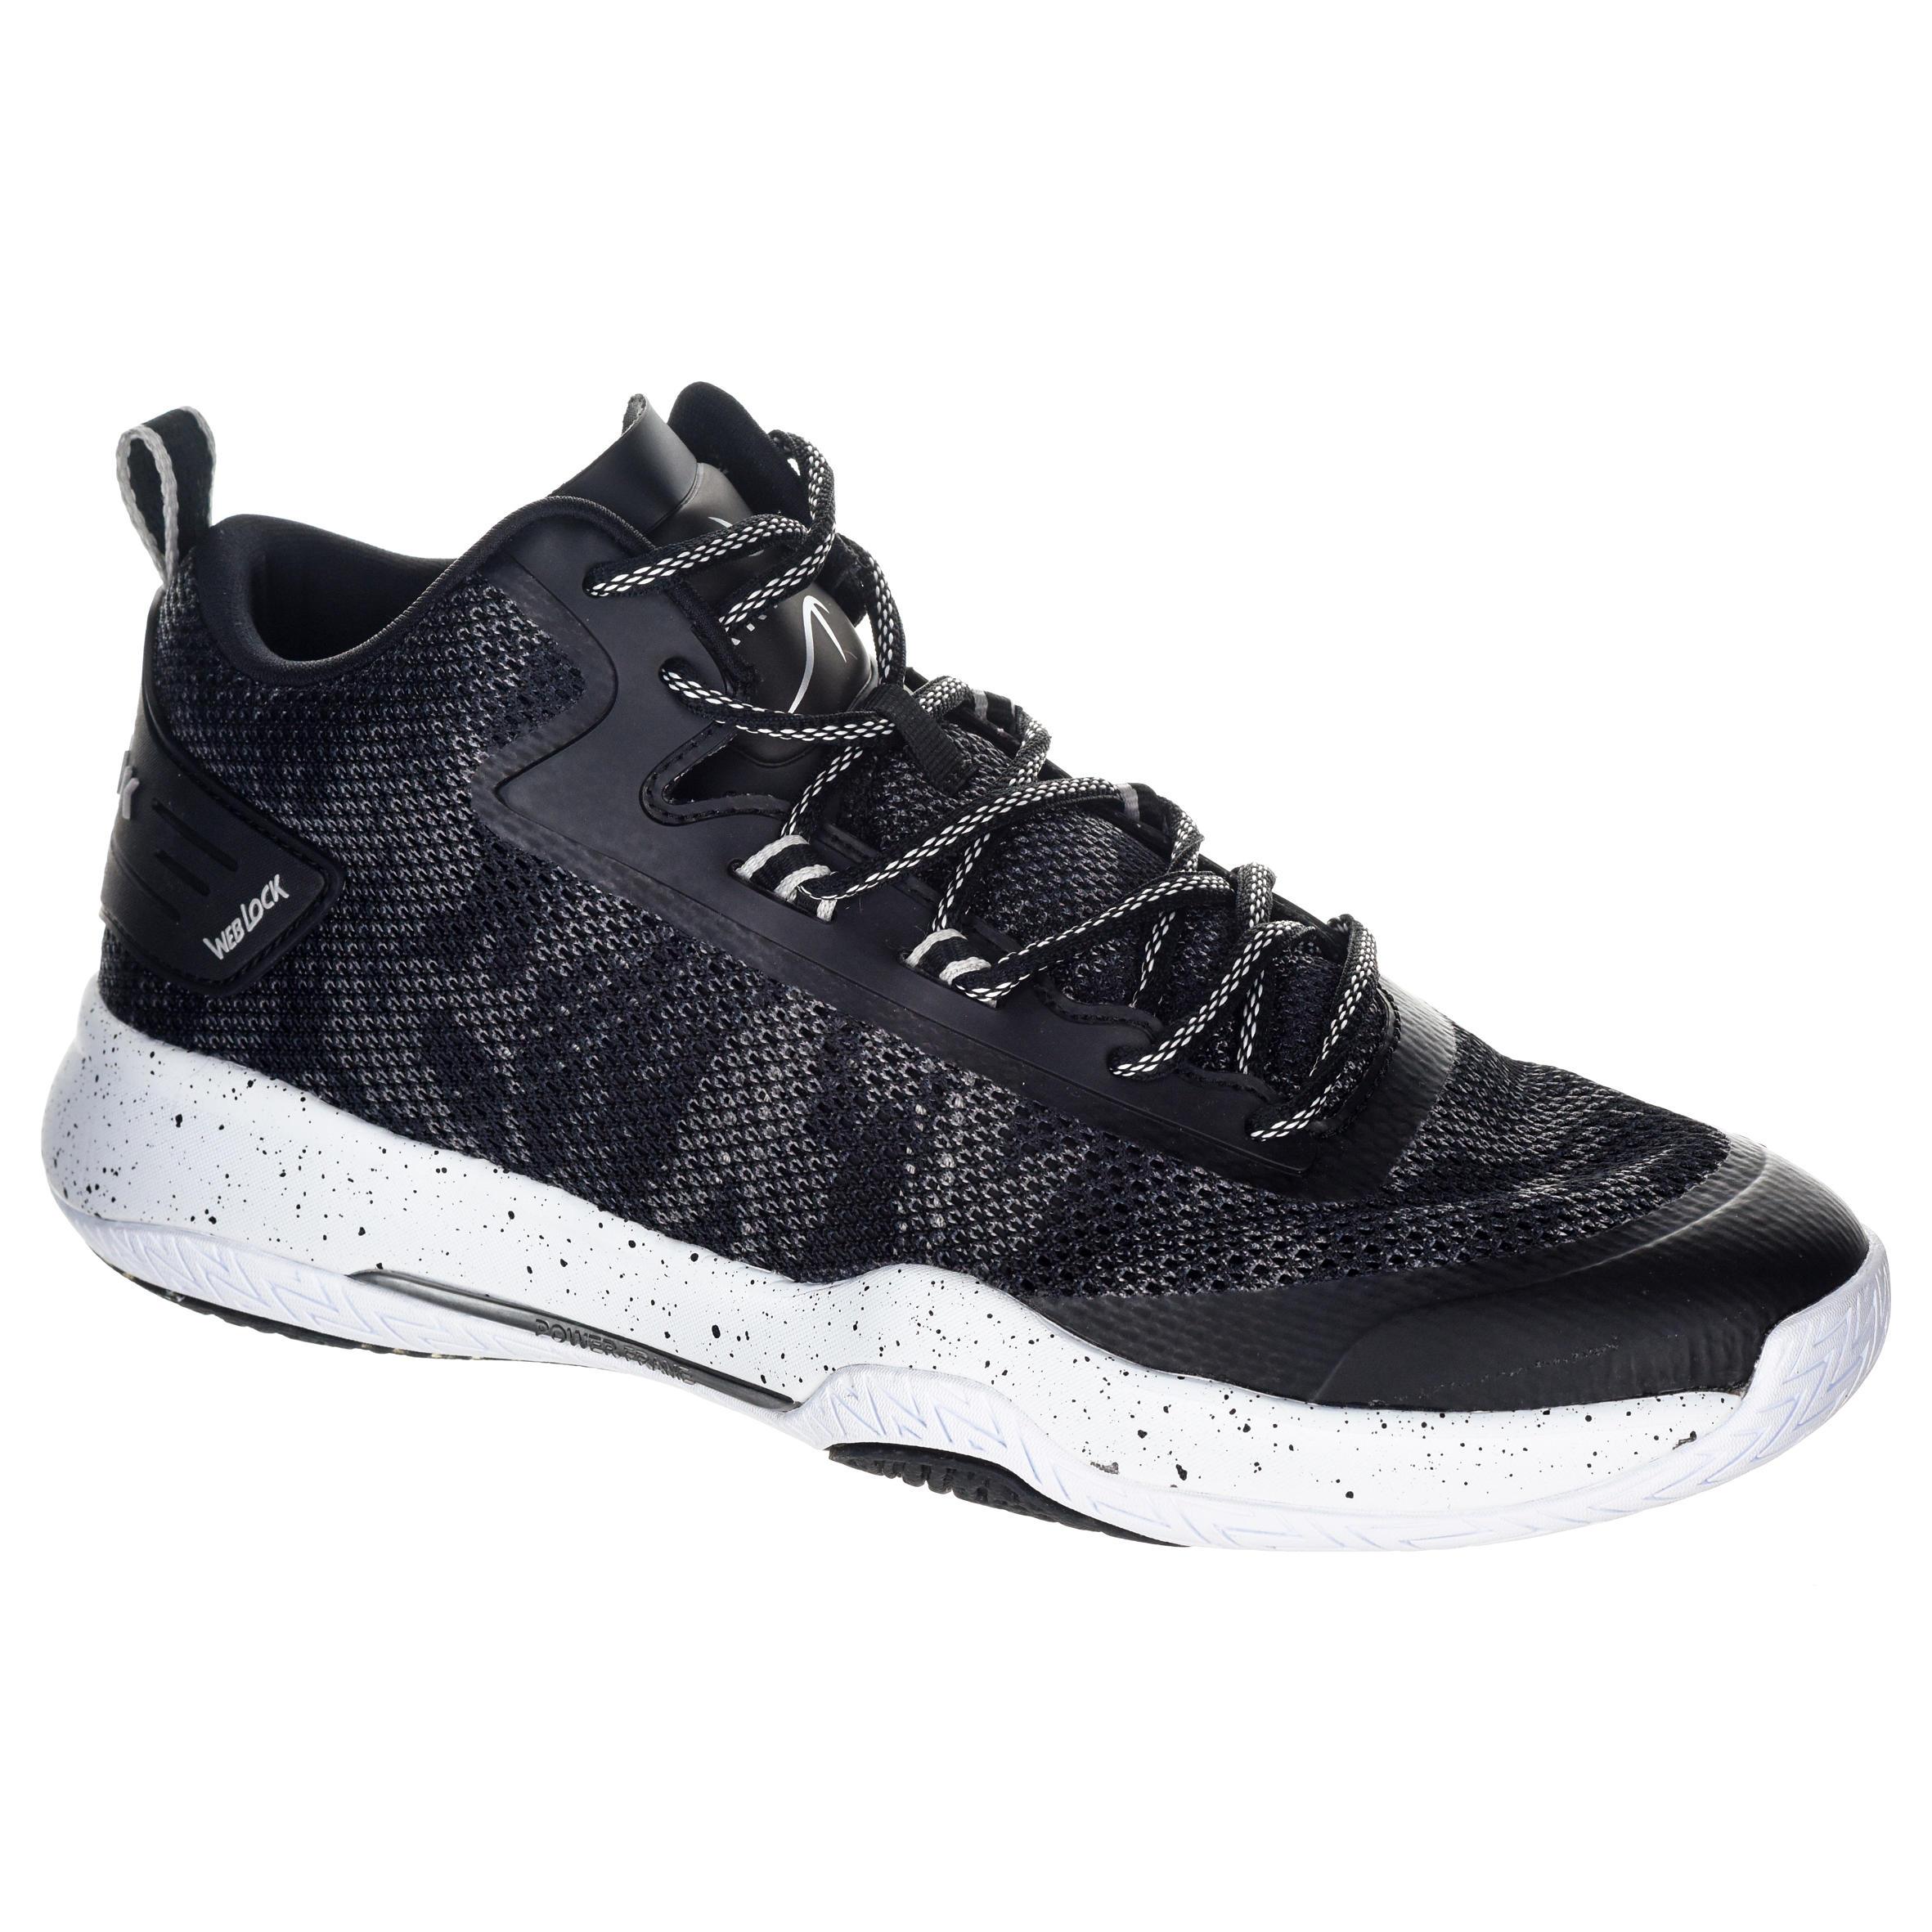 Tarmak Basketbalschoenen volwassenen H/D halfgevorderden SC 500 mid zwart wit